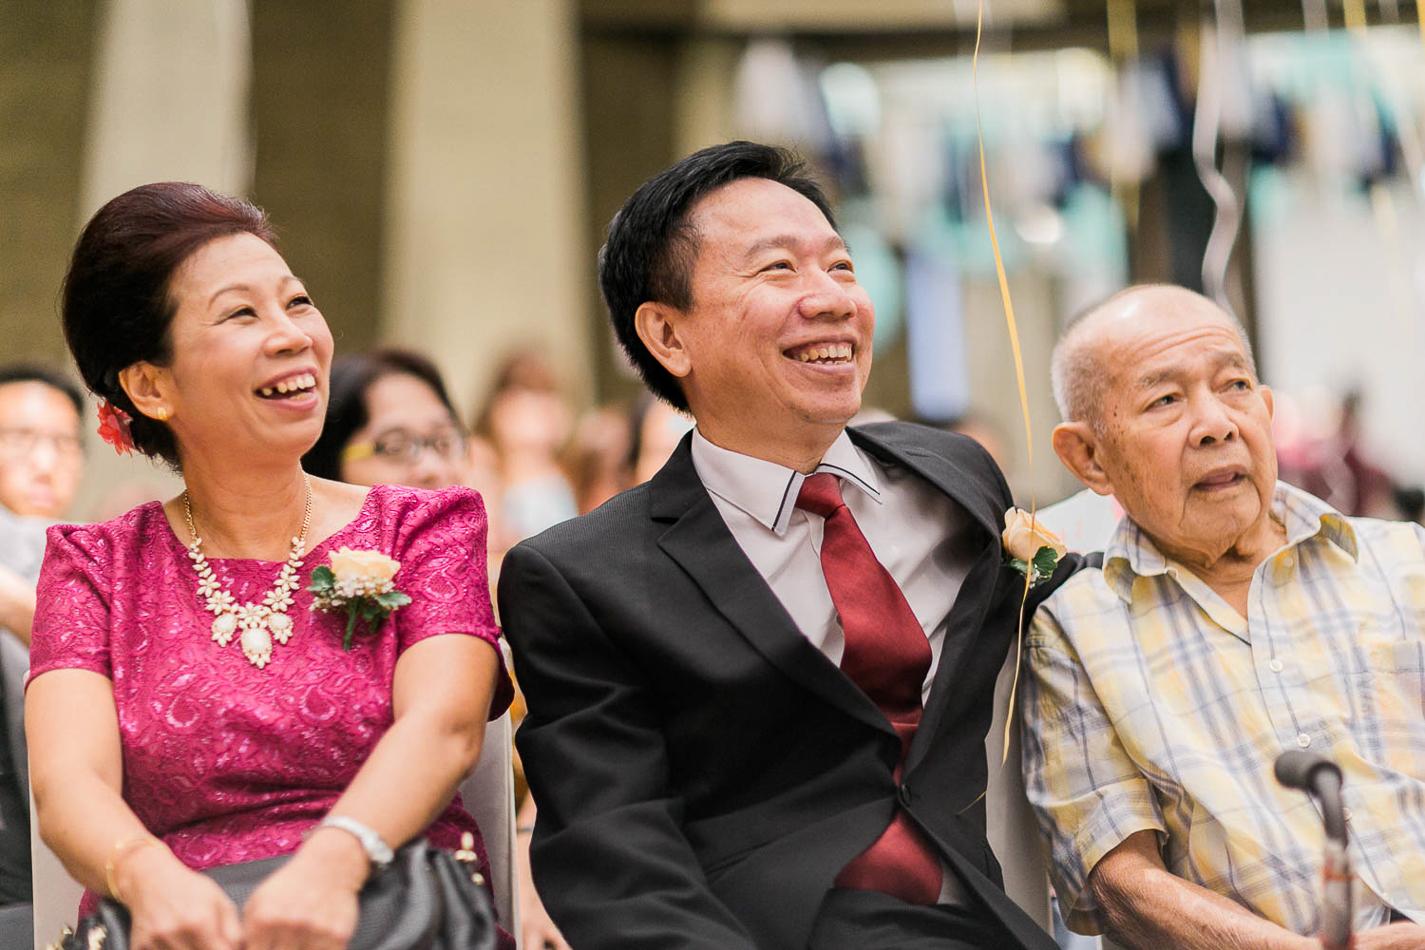 wedding-photographer-singapore-film-photographer-chen-sands-MinKang-wedding-CSPBLOG-3.jpg